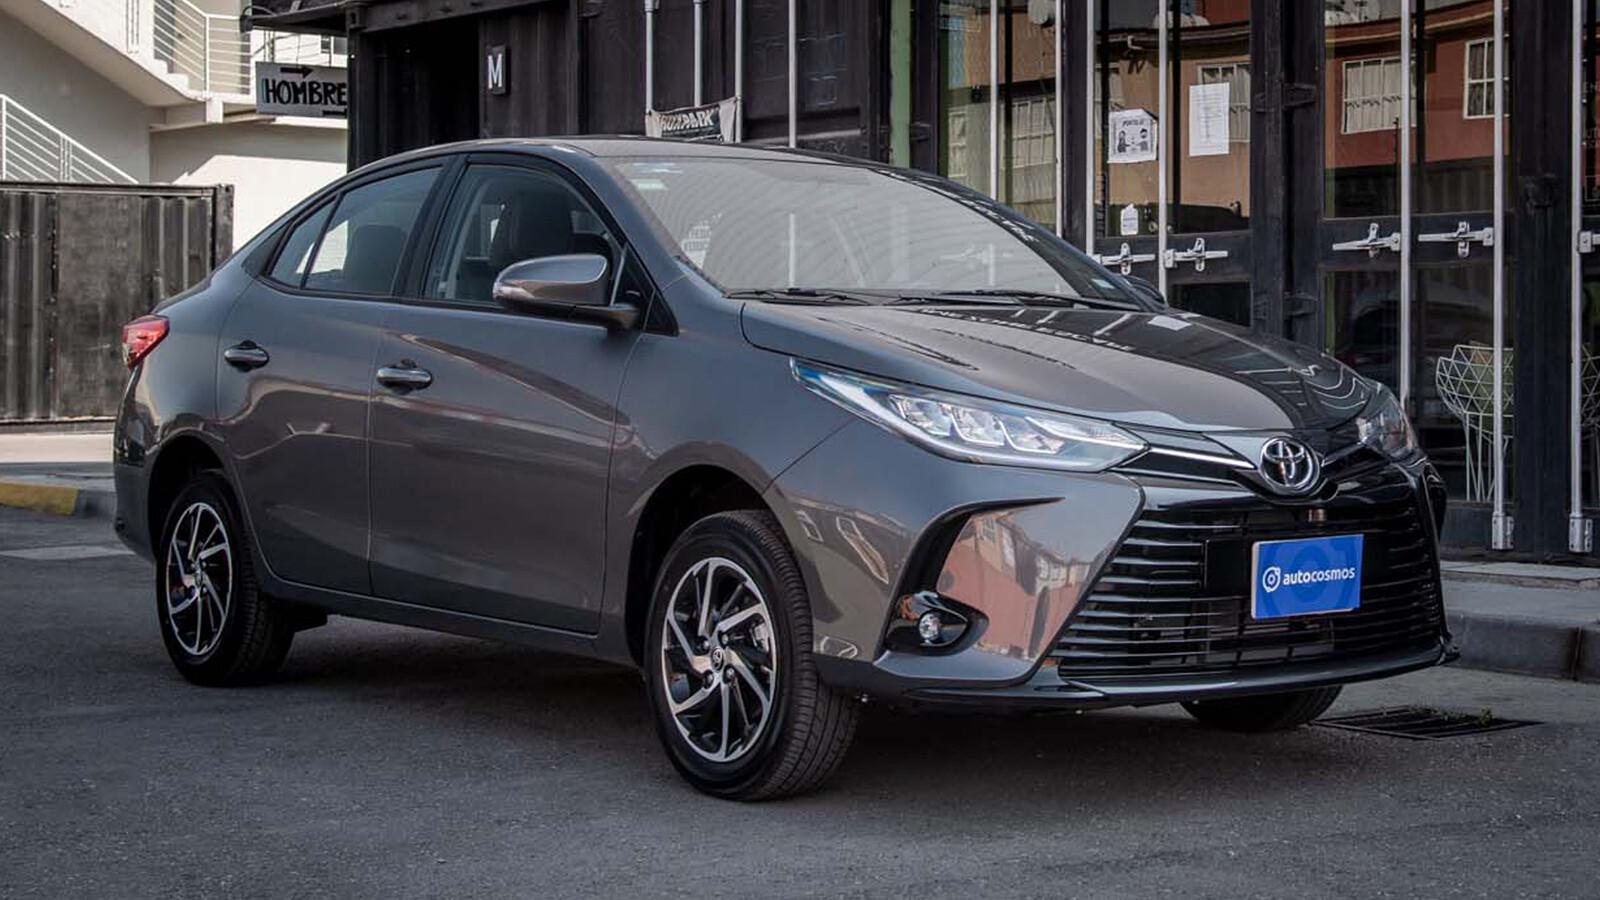 Manejamos el Toyota Yaris Sedán 2021